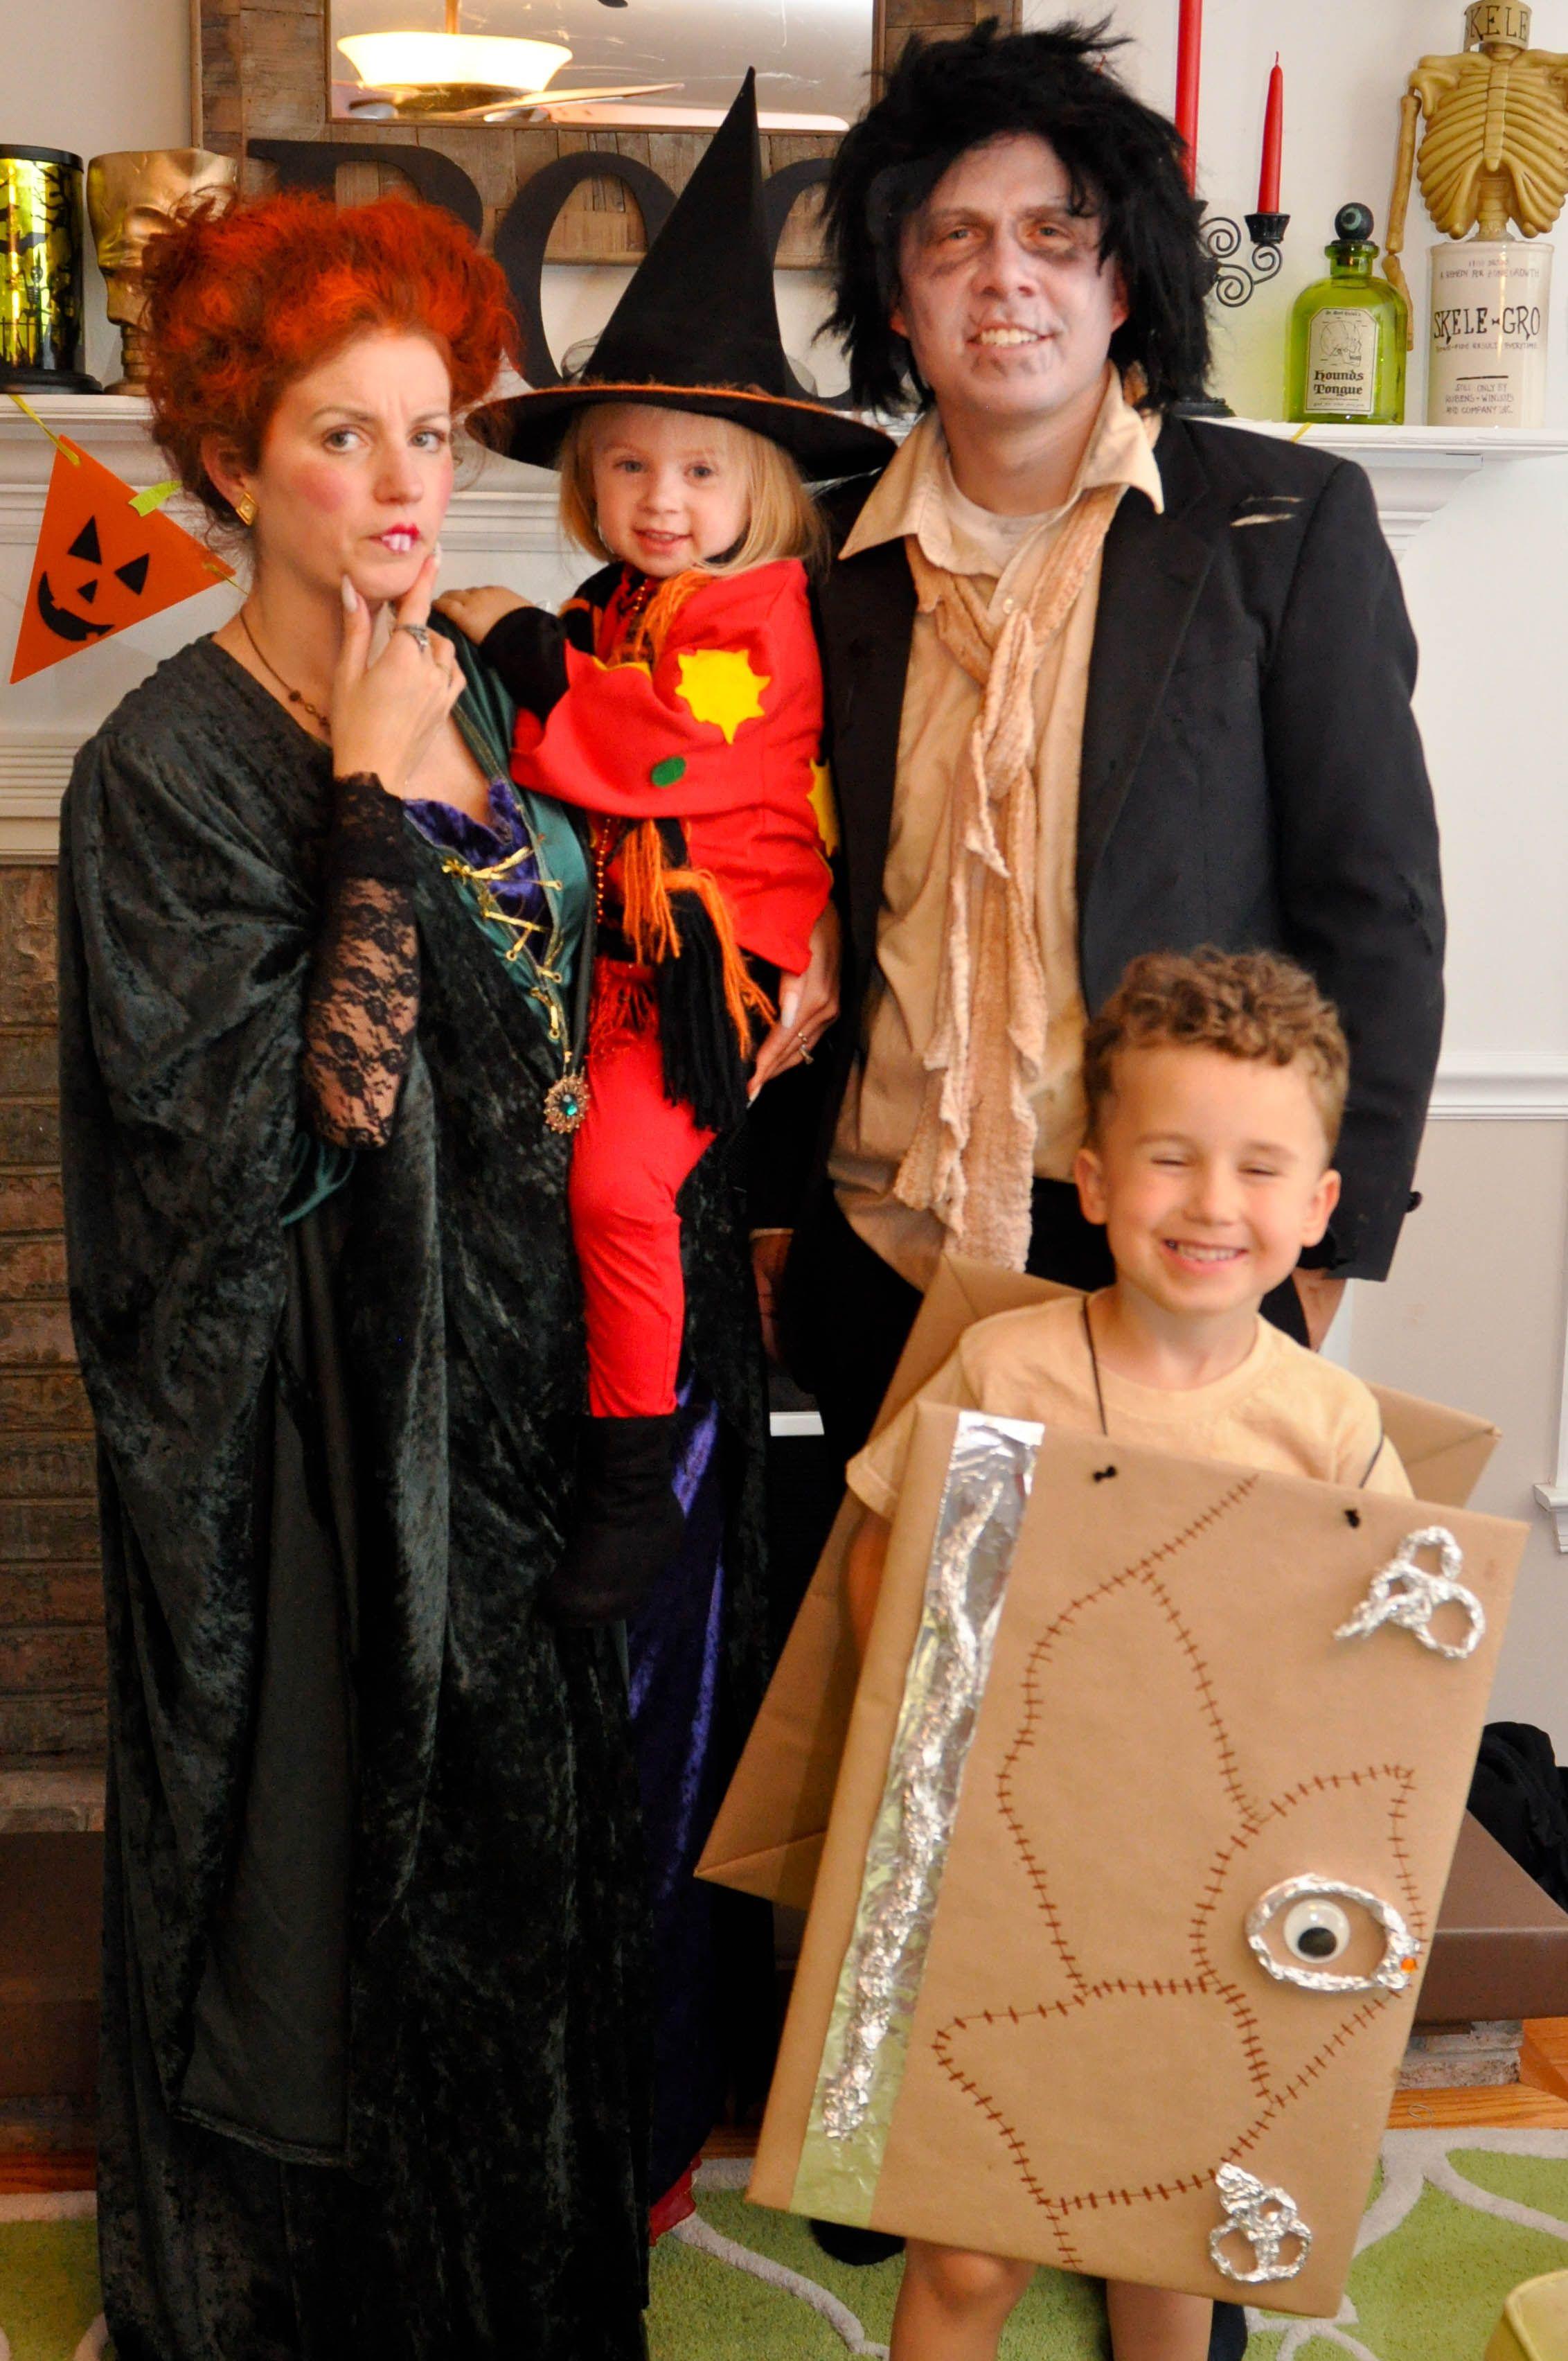 Hocus Pocus Halloween Costume Idea Winifred Sanderson Dani Billy Spell Book Costum Hocus Pocus Halloween Costumes Family Halloween Costumes Halloween Party